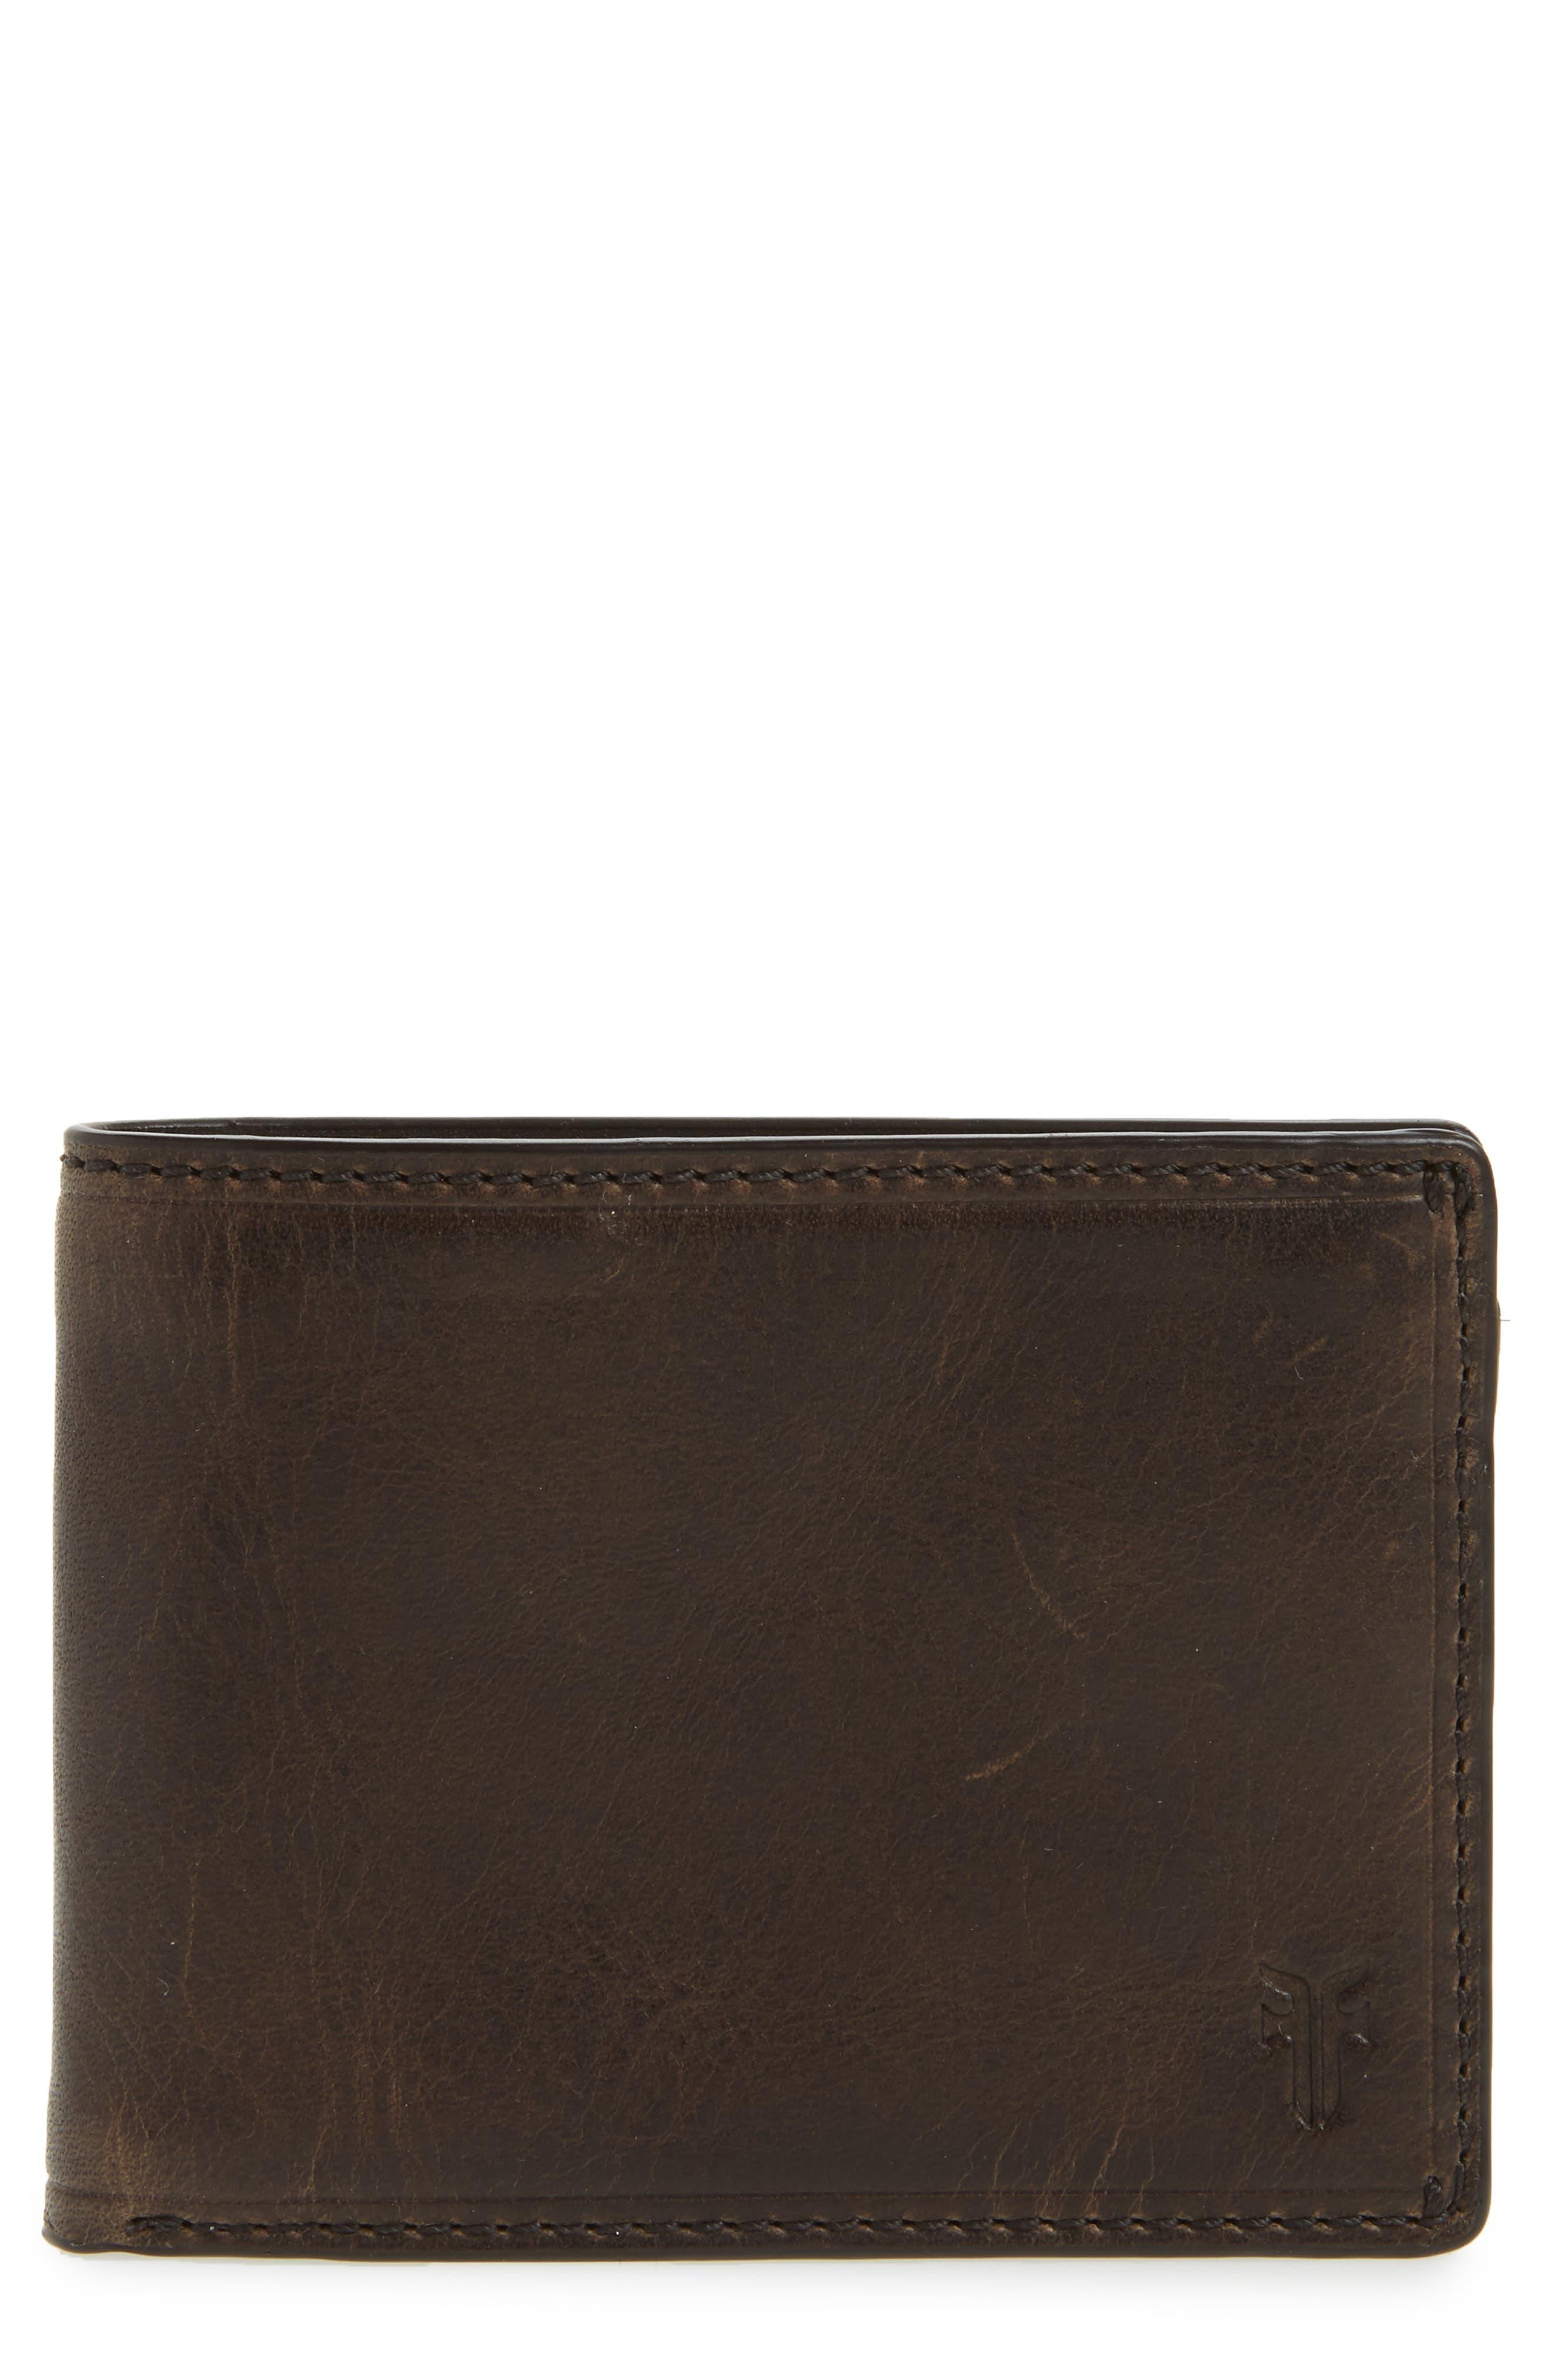 Alternate Image 1 Selected - Frye Logan Leather Wallet